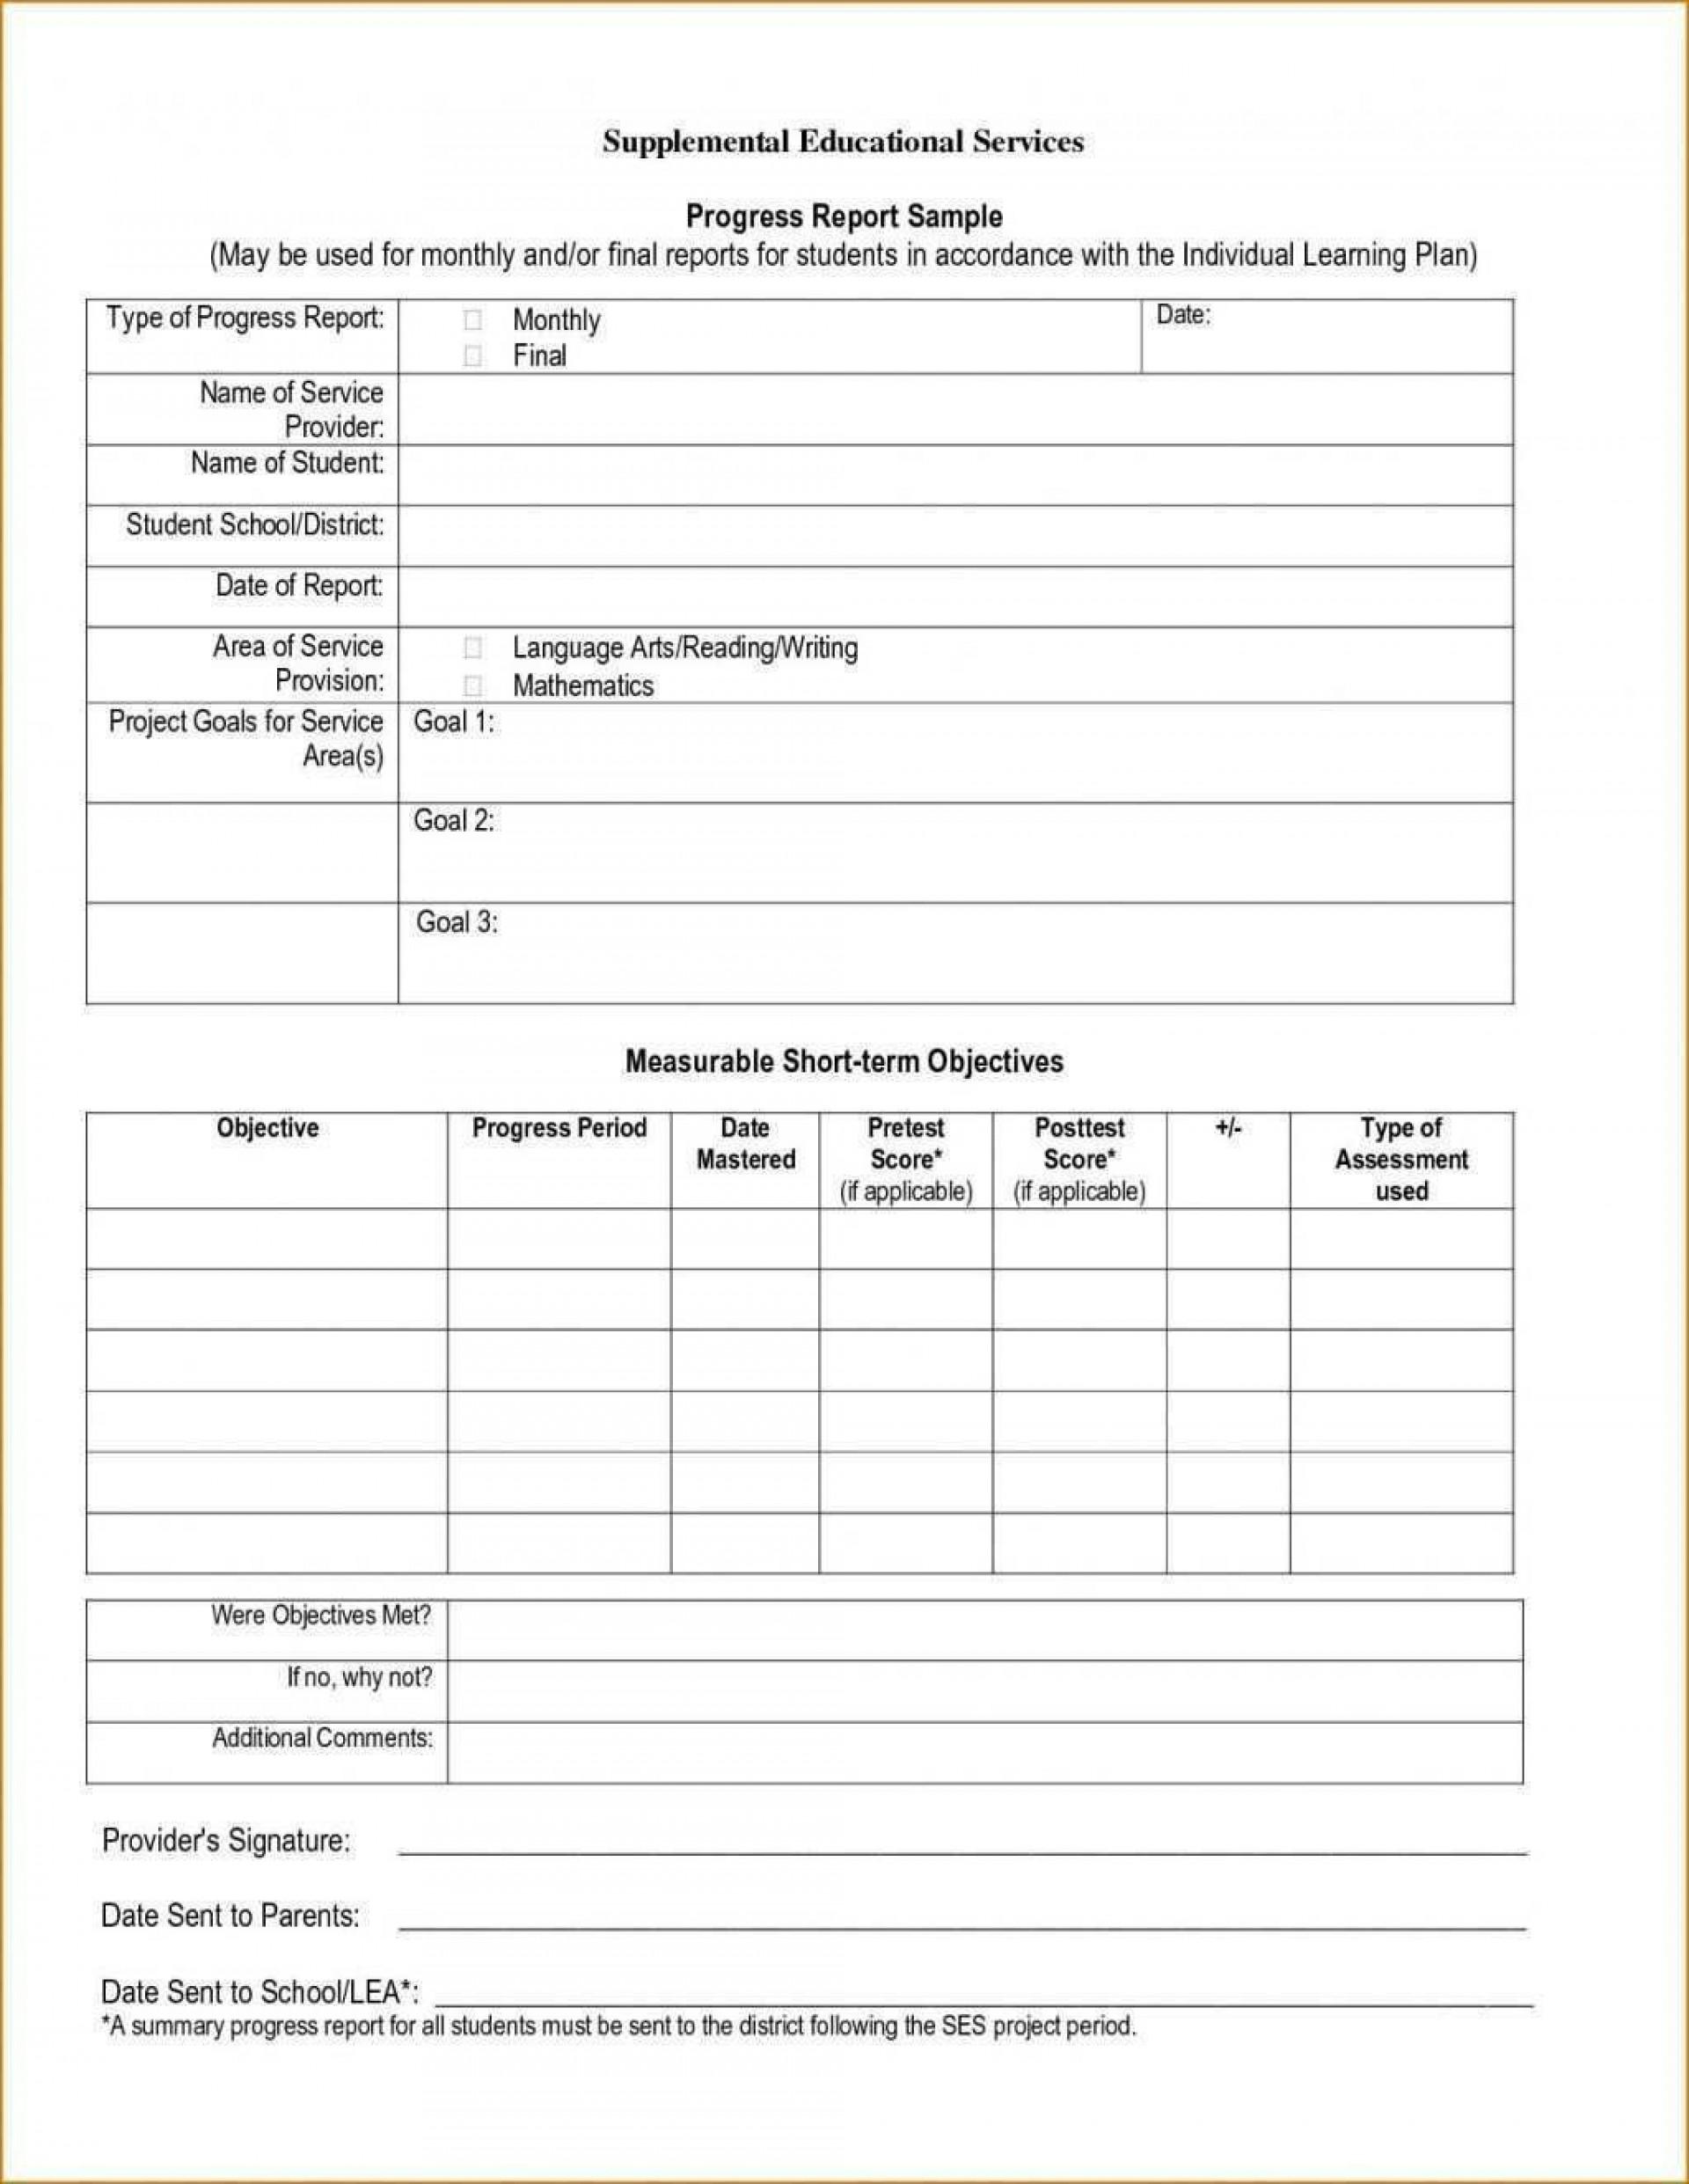 003 Surprising Middle School Report Card Template Inspiration  Pdf Homeschool Free Standard Based Sample1920